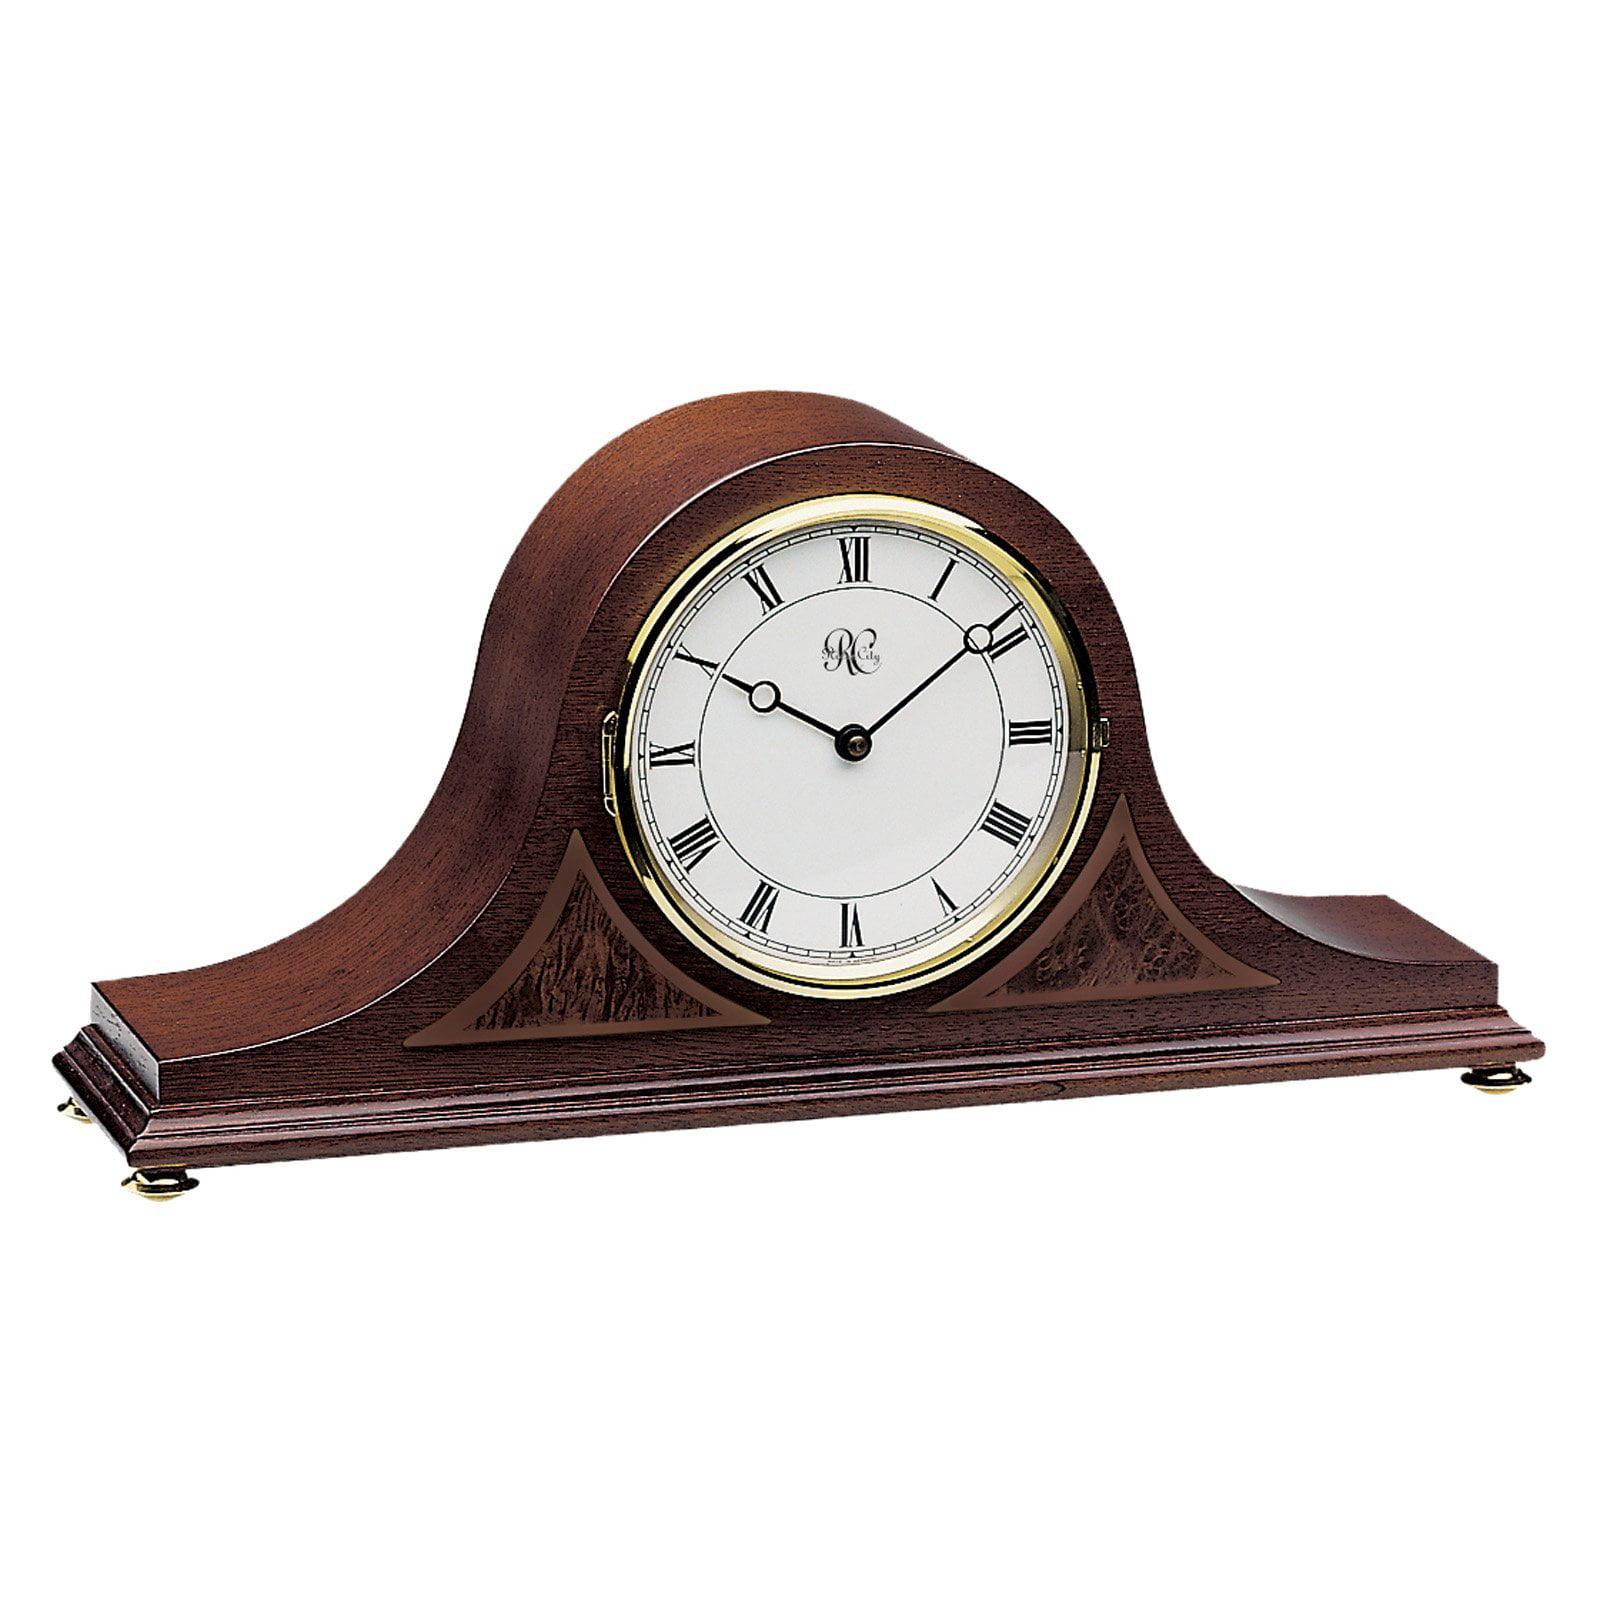 River City Clocks Walnut Tambour Mantel Clock by River City Clocks